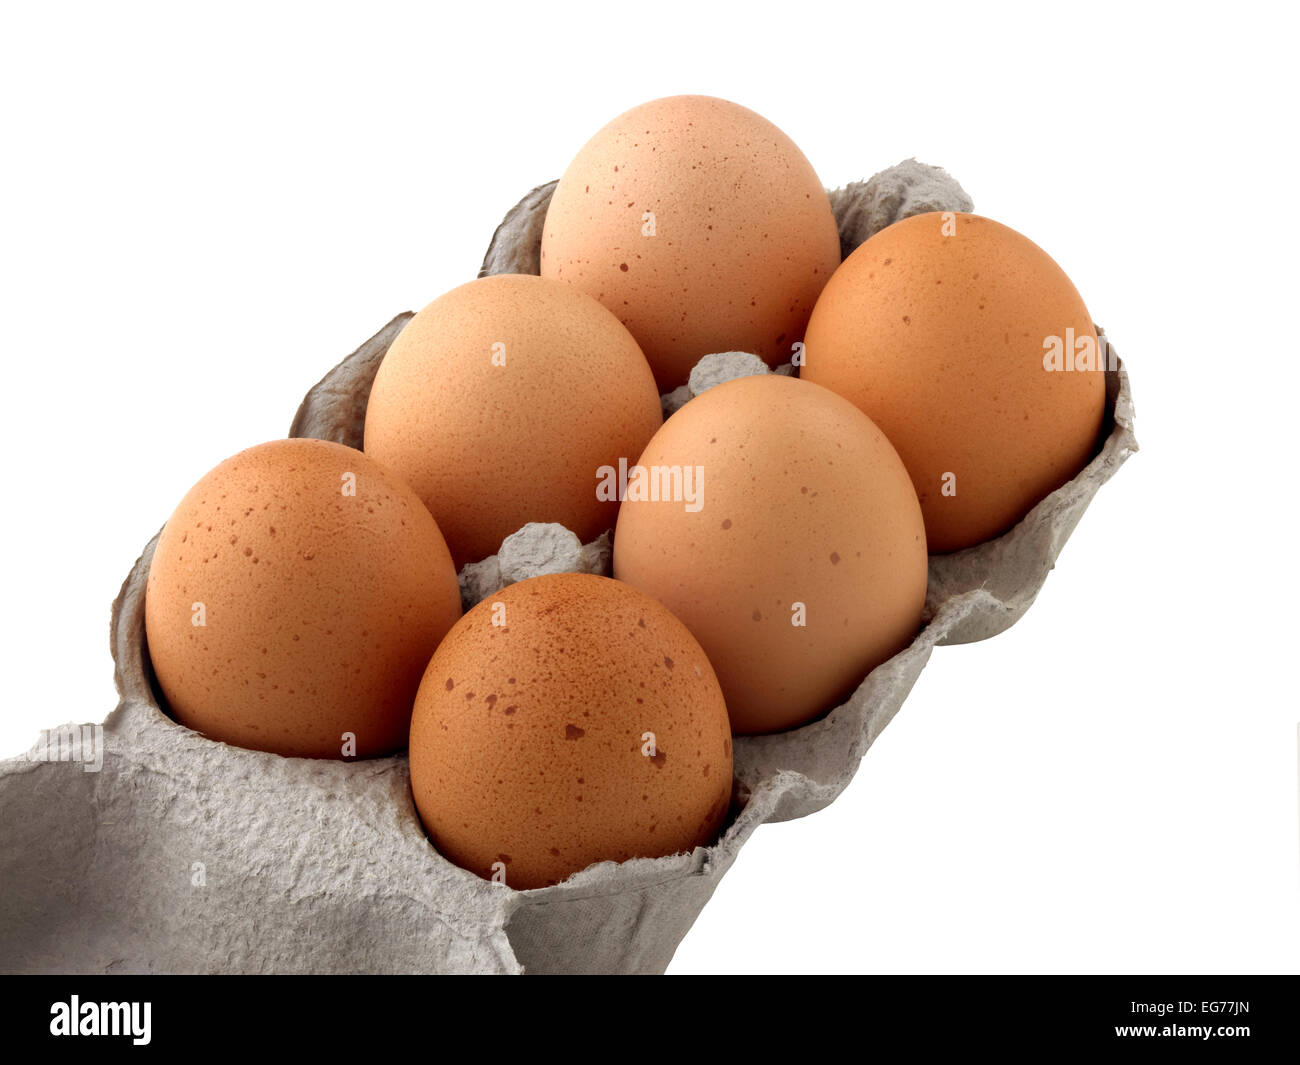 six eggs - Stock Image